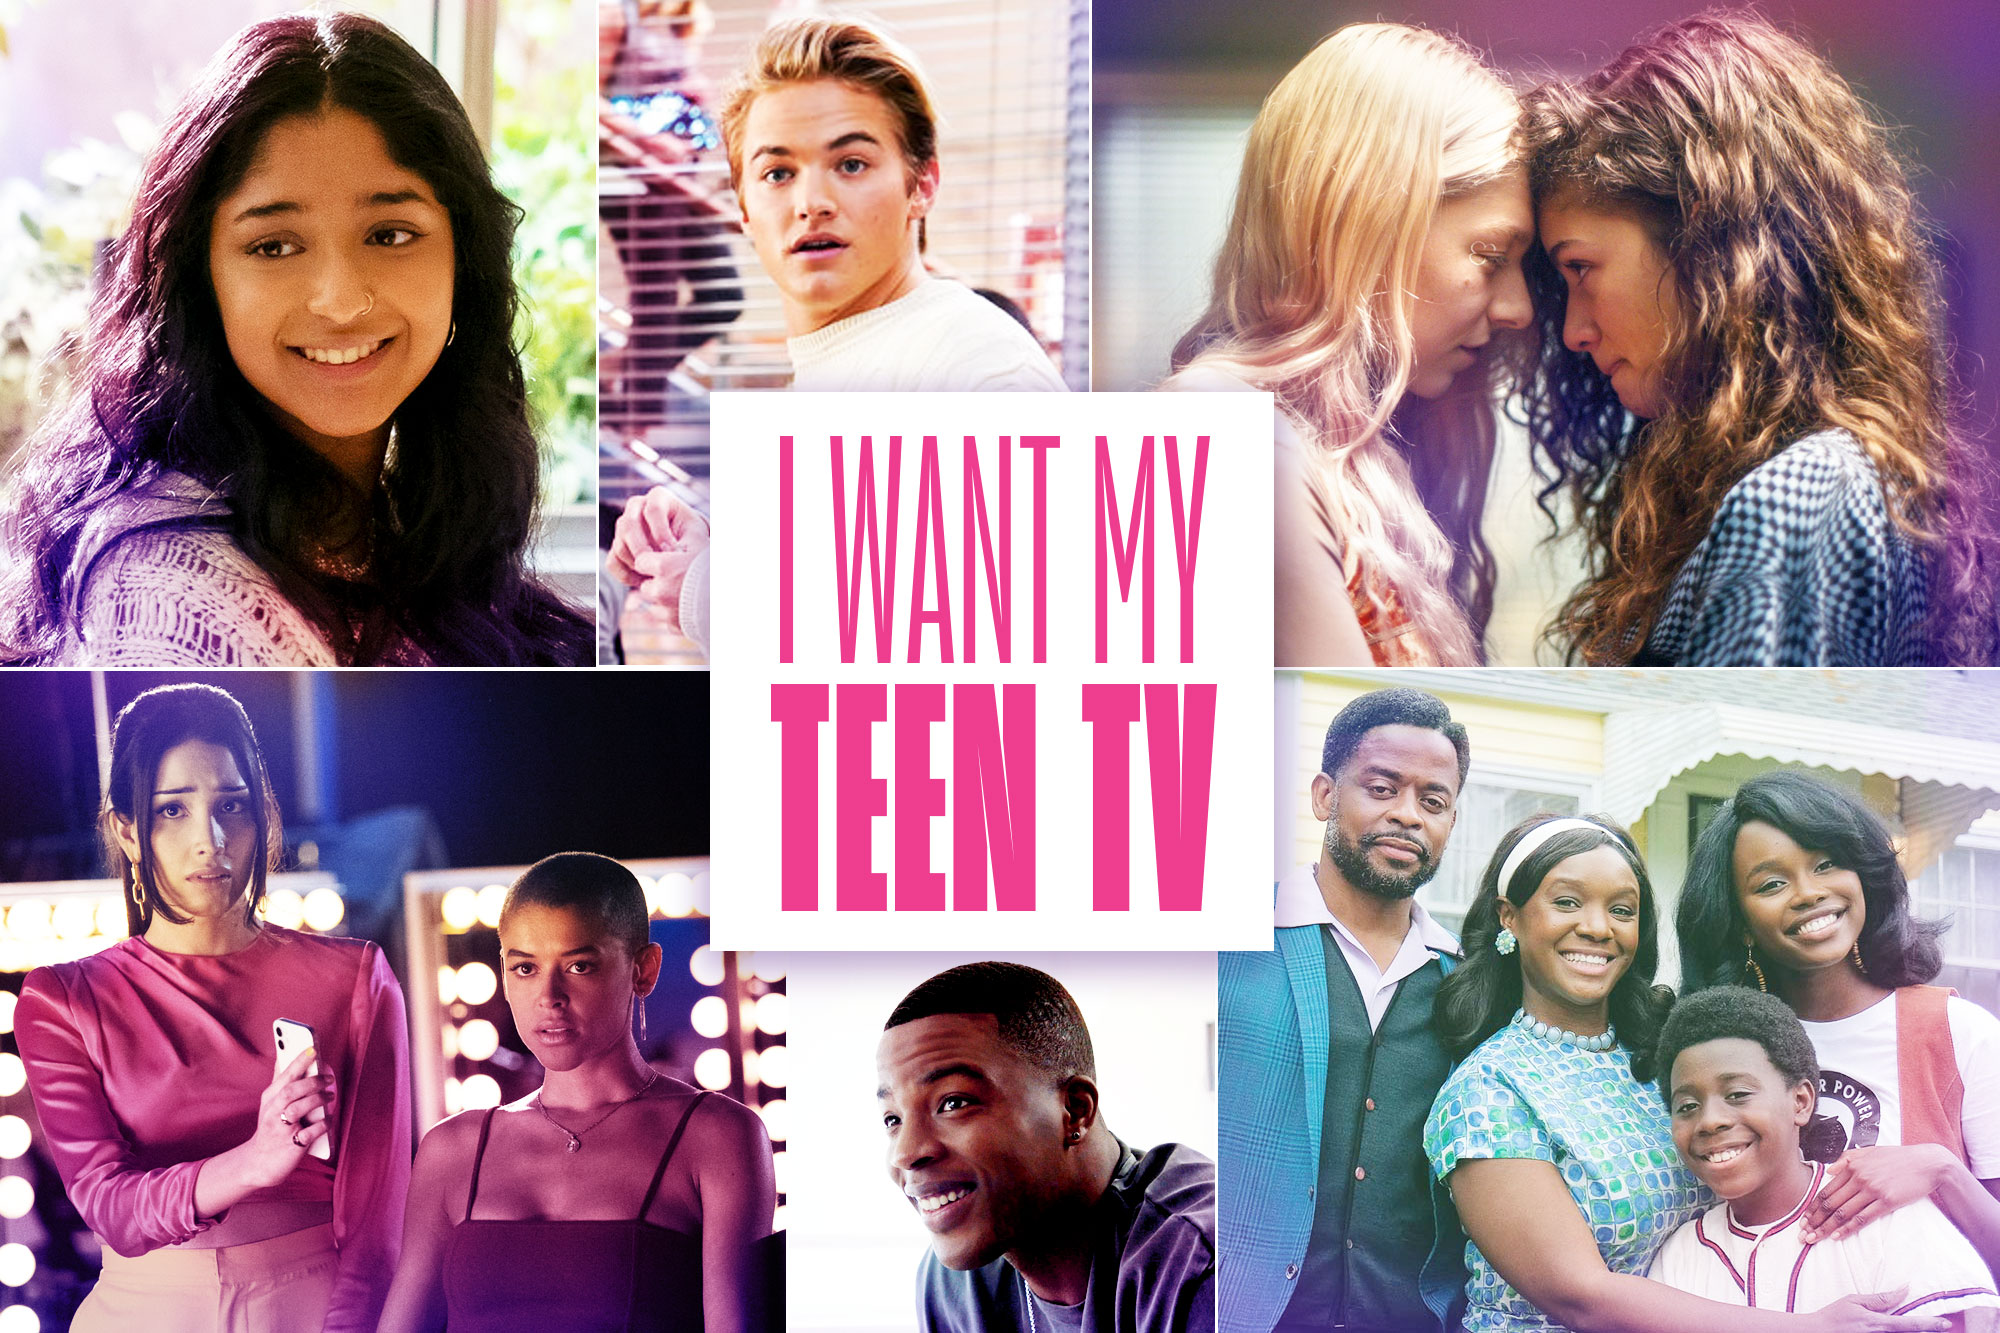 I Want My Teen TV